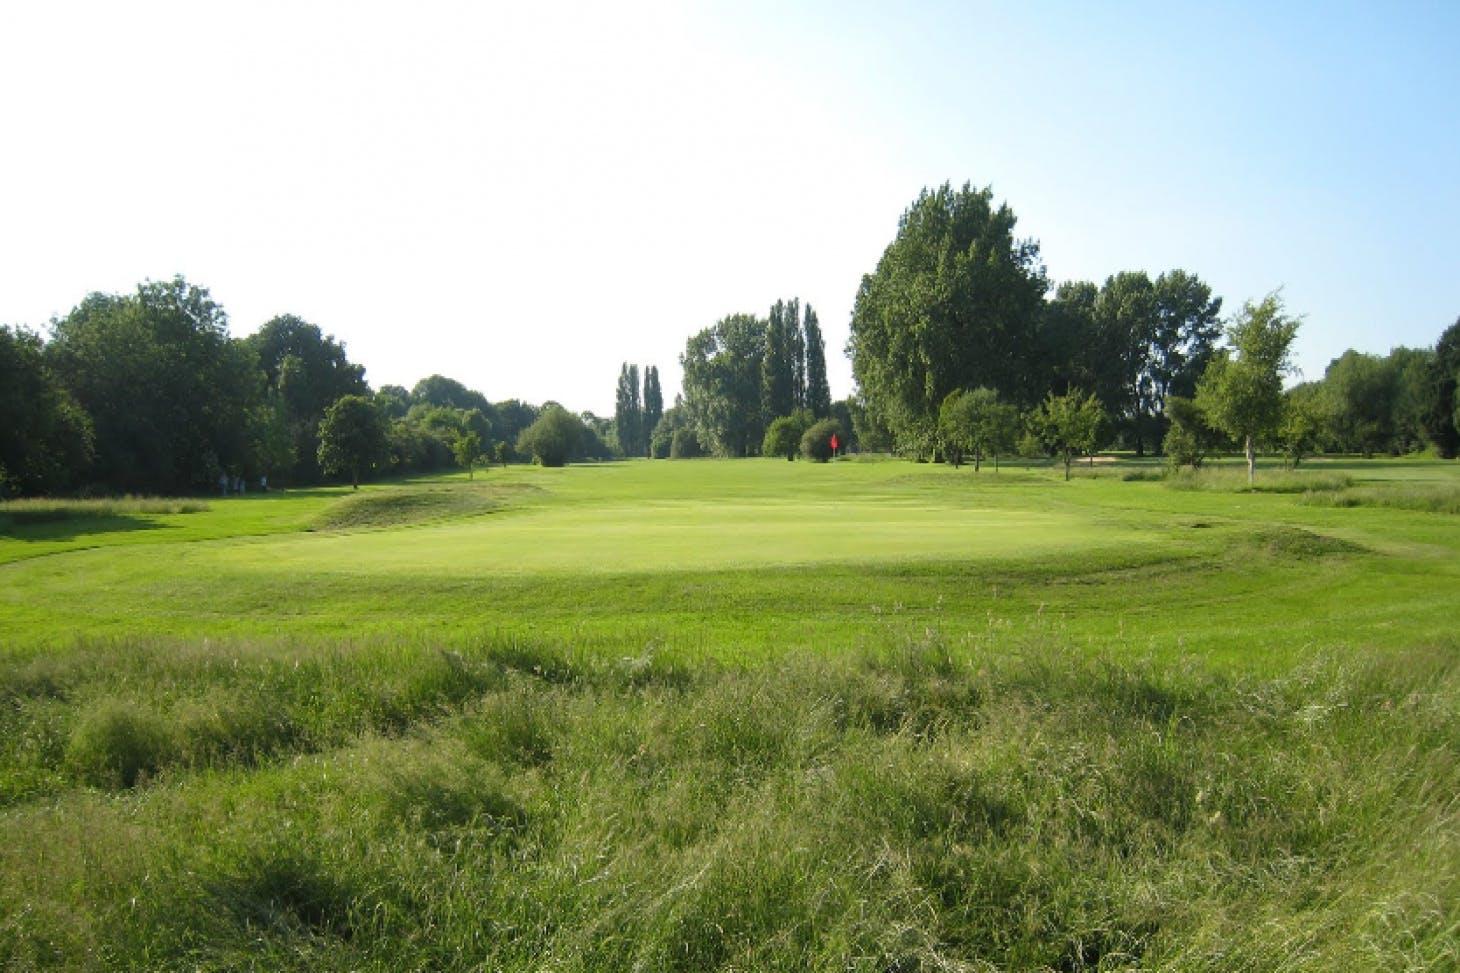 Datchet Golf Club 18 hole golf course